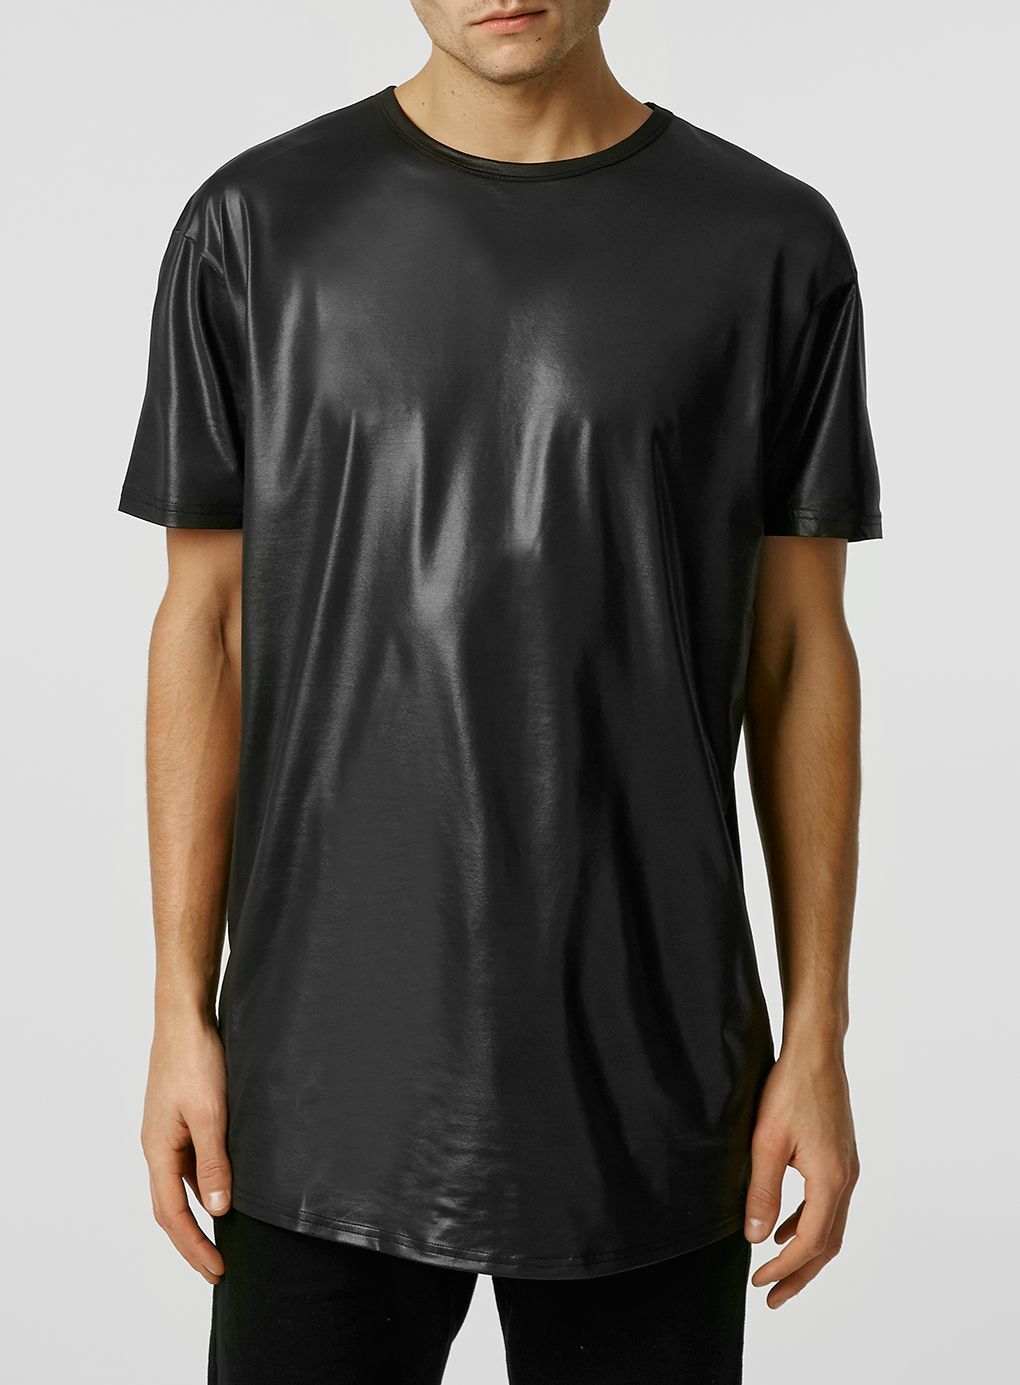 topman short sleeve wet look long line t shirt in black. Black Bedroom Furniture Sets. Home Design Ideas